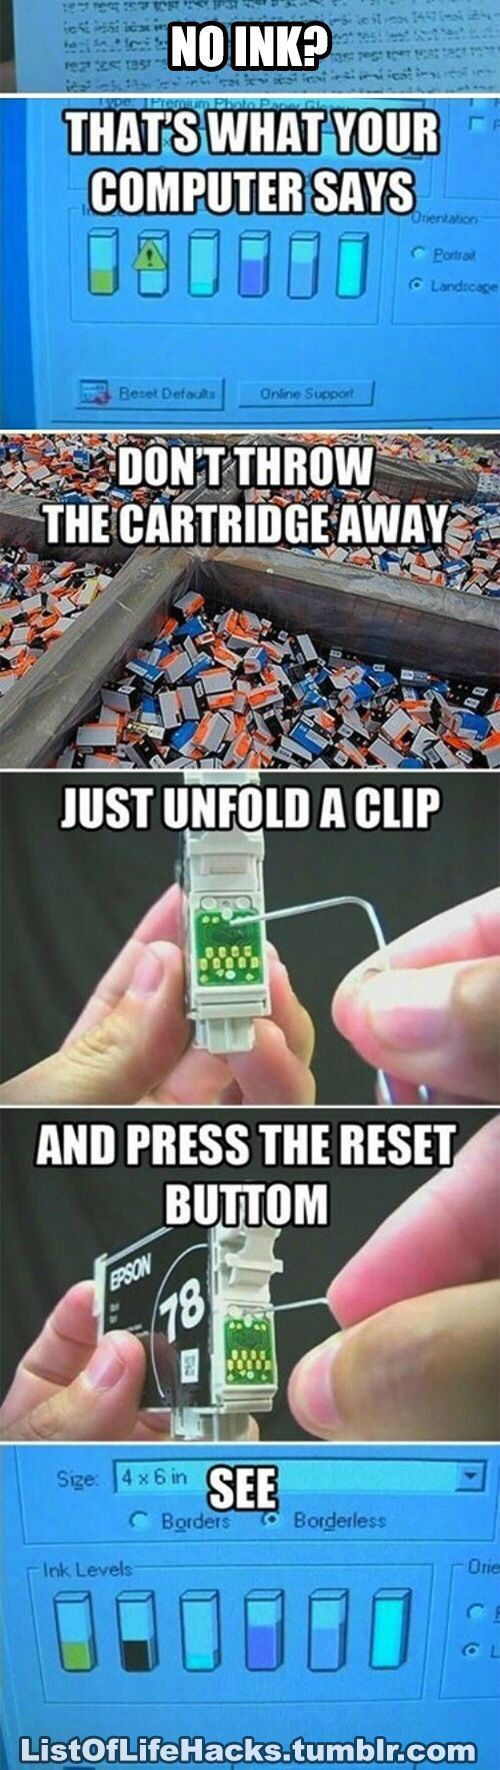 printer cartridge reset